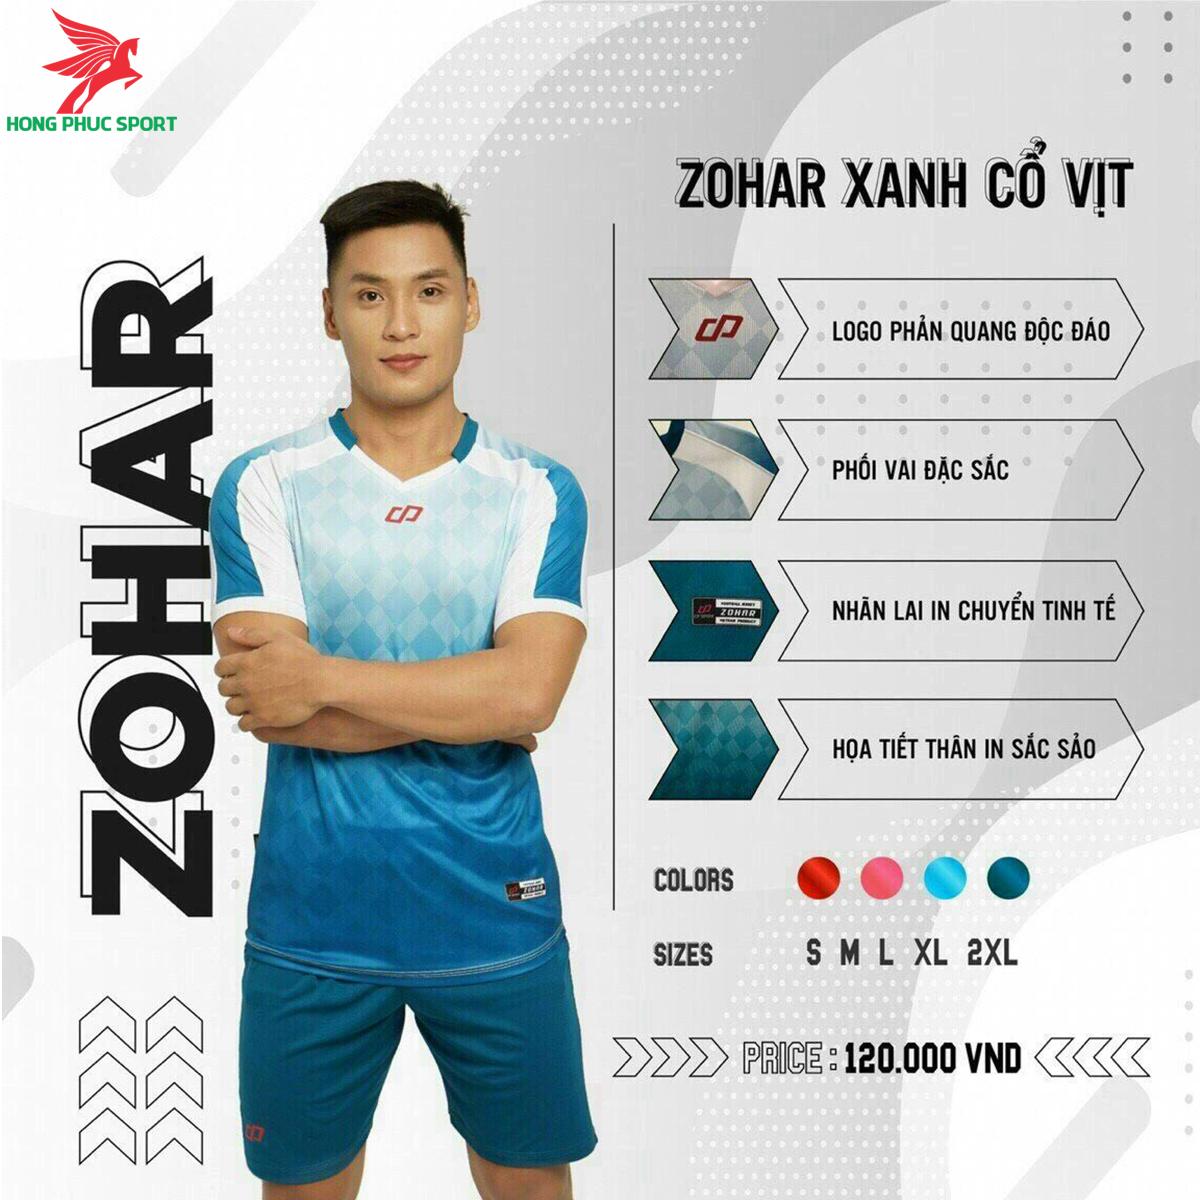 https://cdn.hongphucsport.com/unsafe/s4.shopbay.vn/files/285/ao-khong-logo-cp-zohar-mau-xanh-co-vit-1-605962e400d19.png